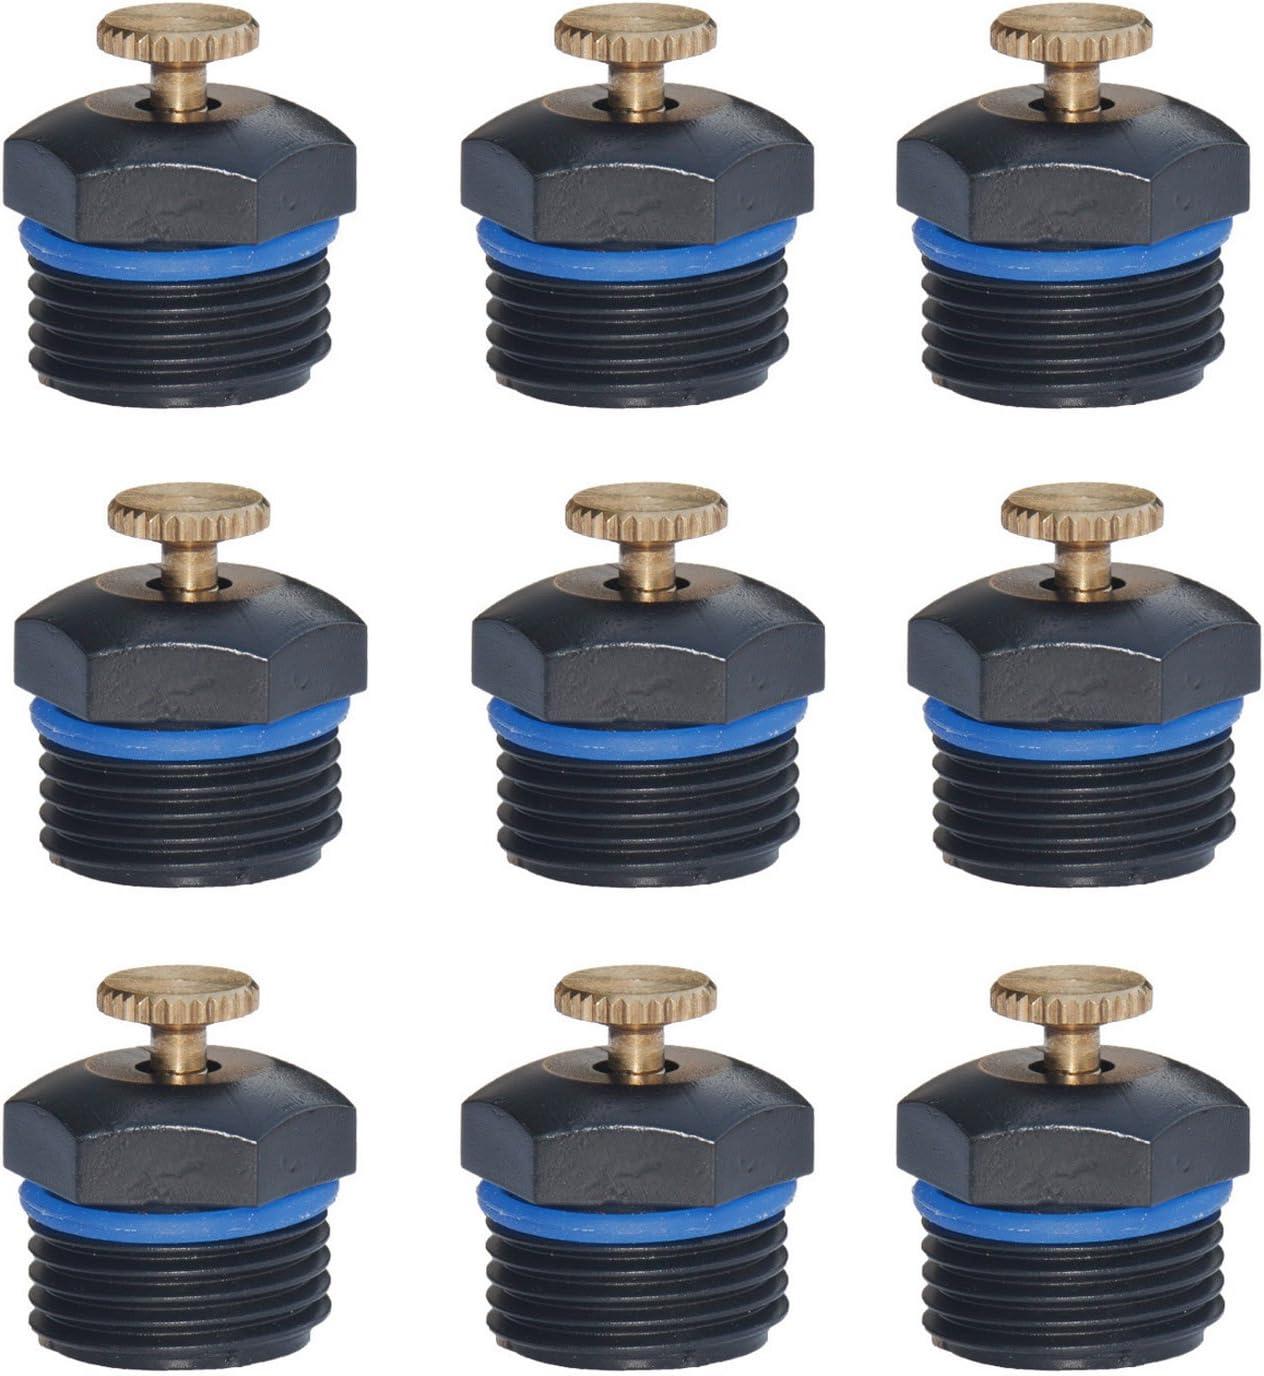 40pcs Micro Garden Sprinkler Irrigation Drip Heads Adjustable-Dripper-Hozel D8Y2